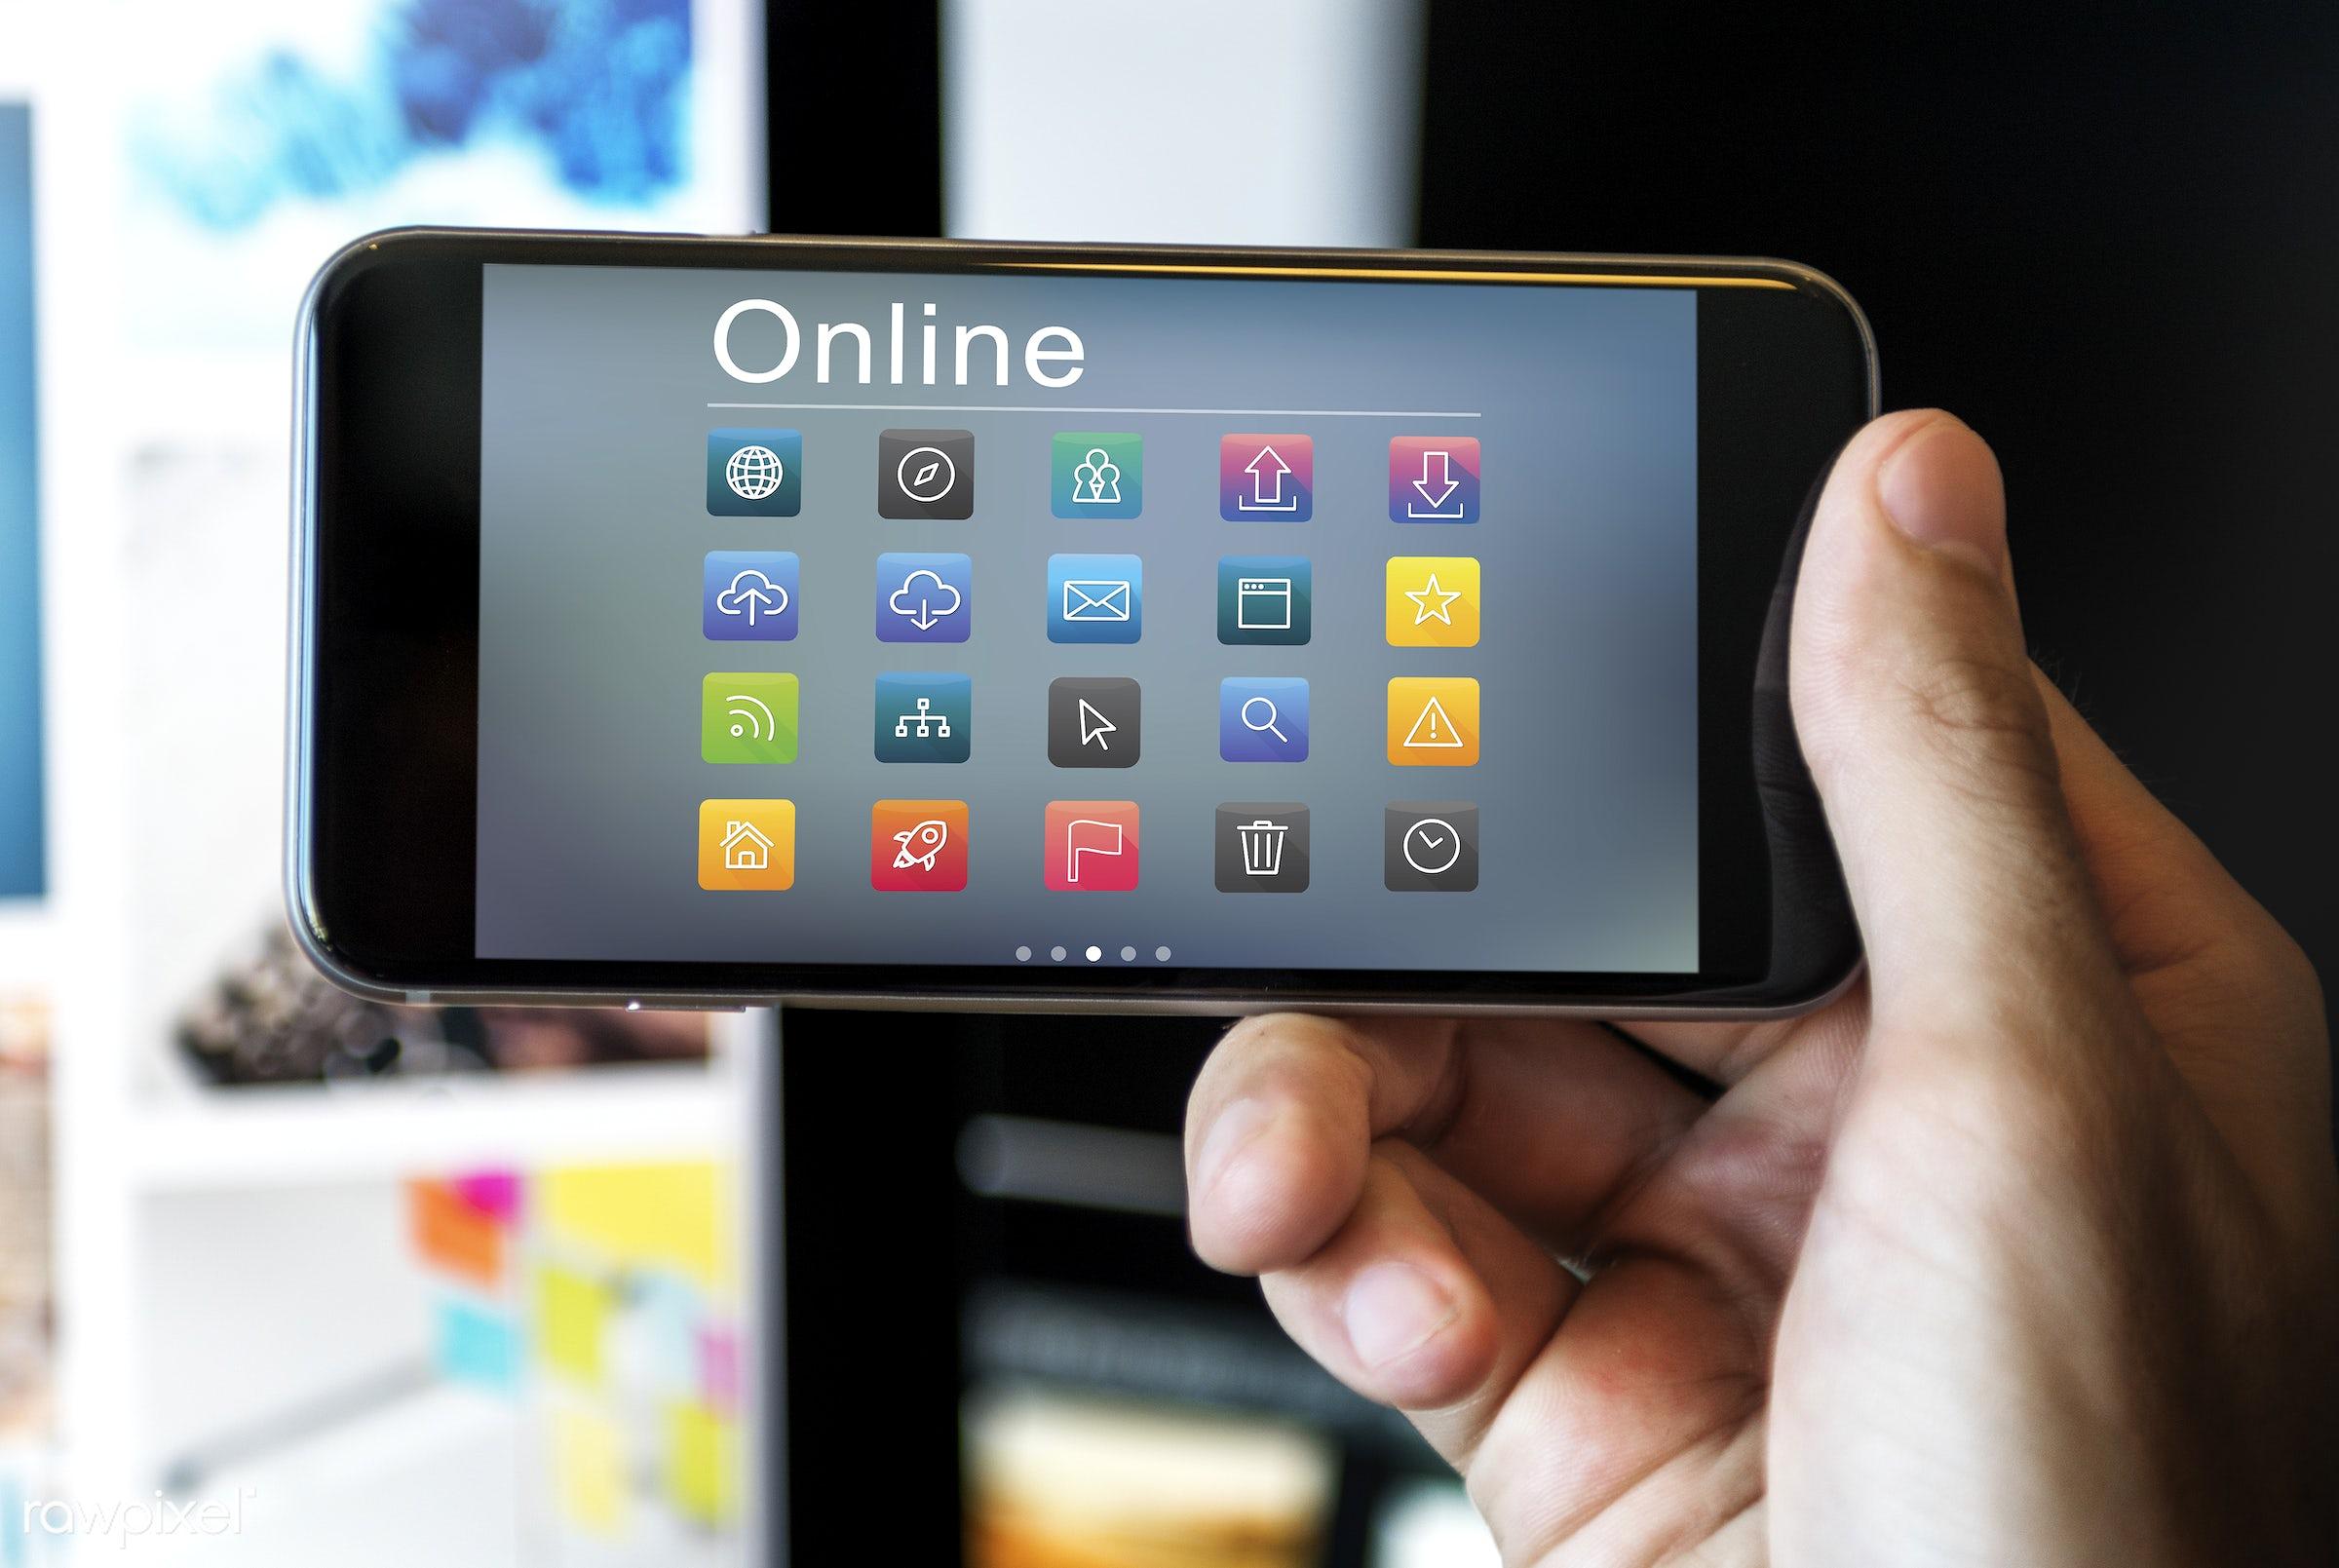 development, app, application, blog, browsing, cloud network, communication, connect, connection, content, digital, digital...